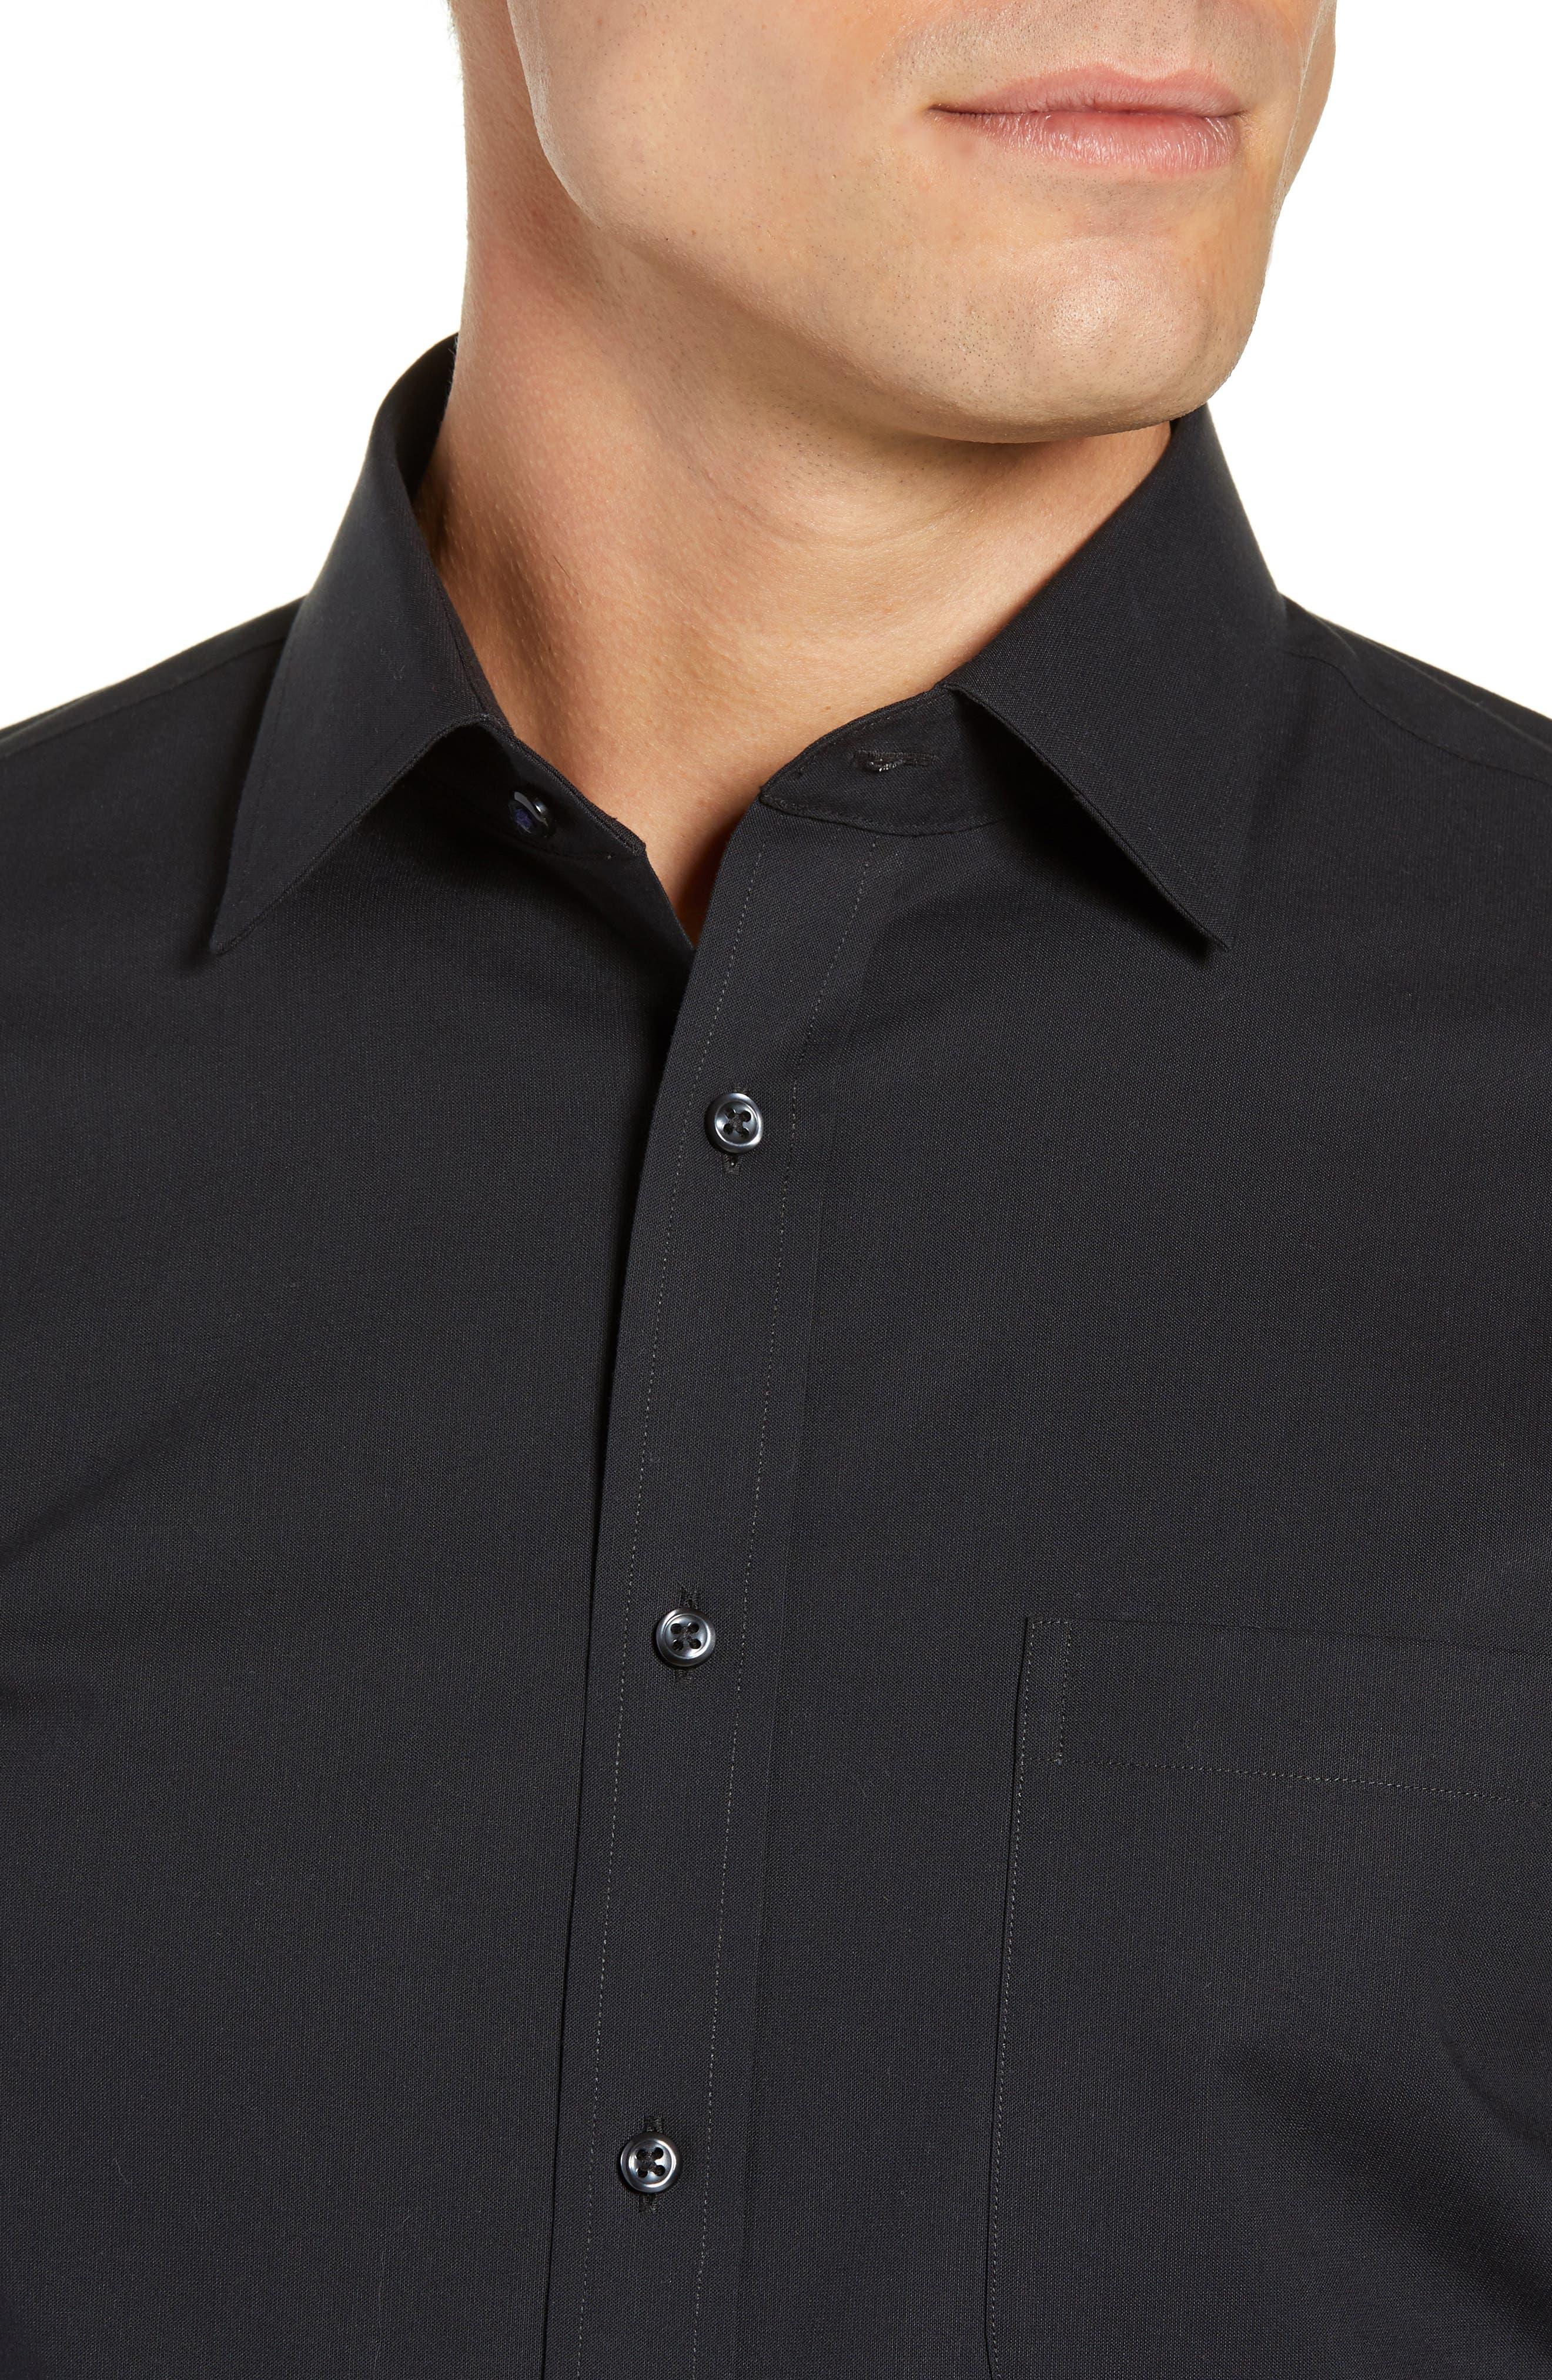 NORDSTROM MEN'S SHOP, Tech-Smart Traditional Fit Stretch Pinpoint Dress Shirt, Alternate thumbnail 2, color, BLACK ROCK